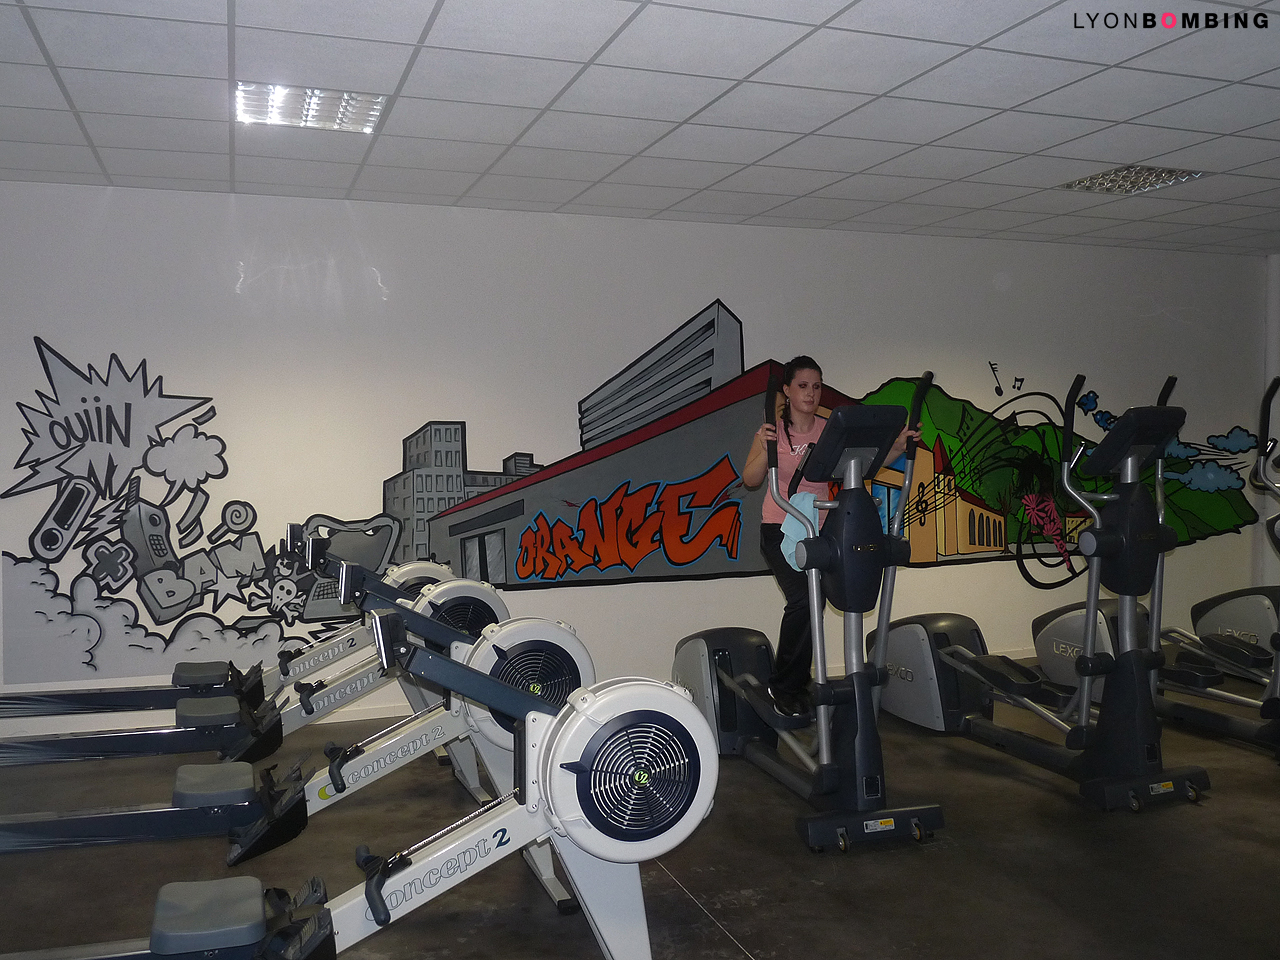 Salle de sport L'Orange Bleue